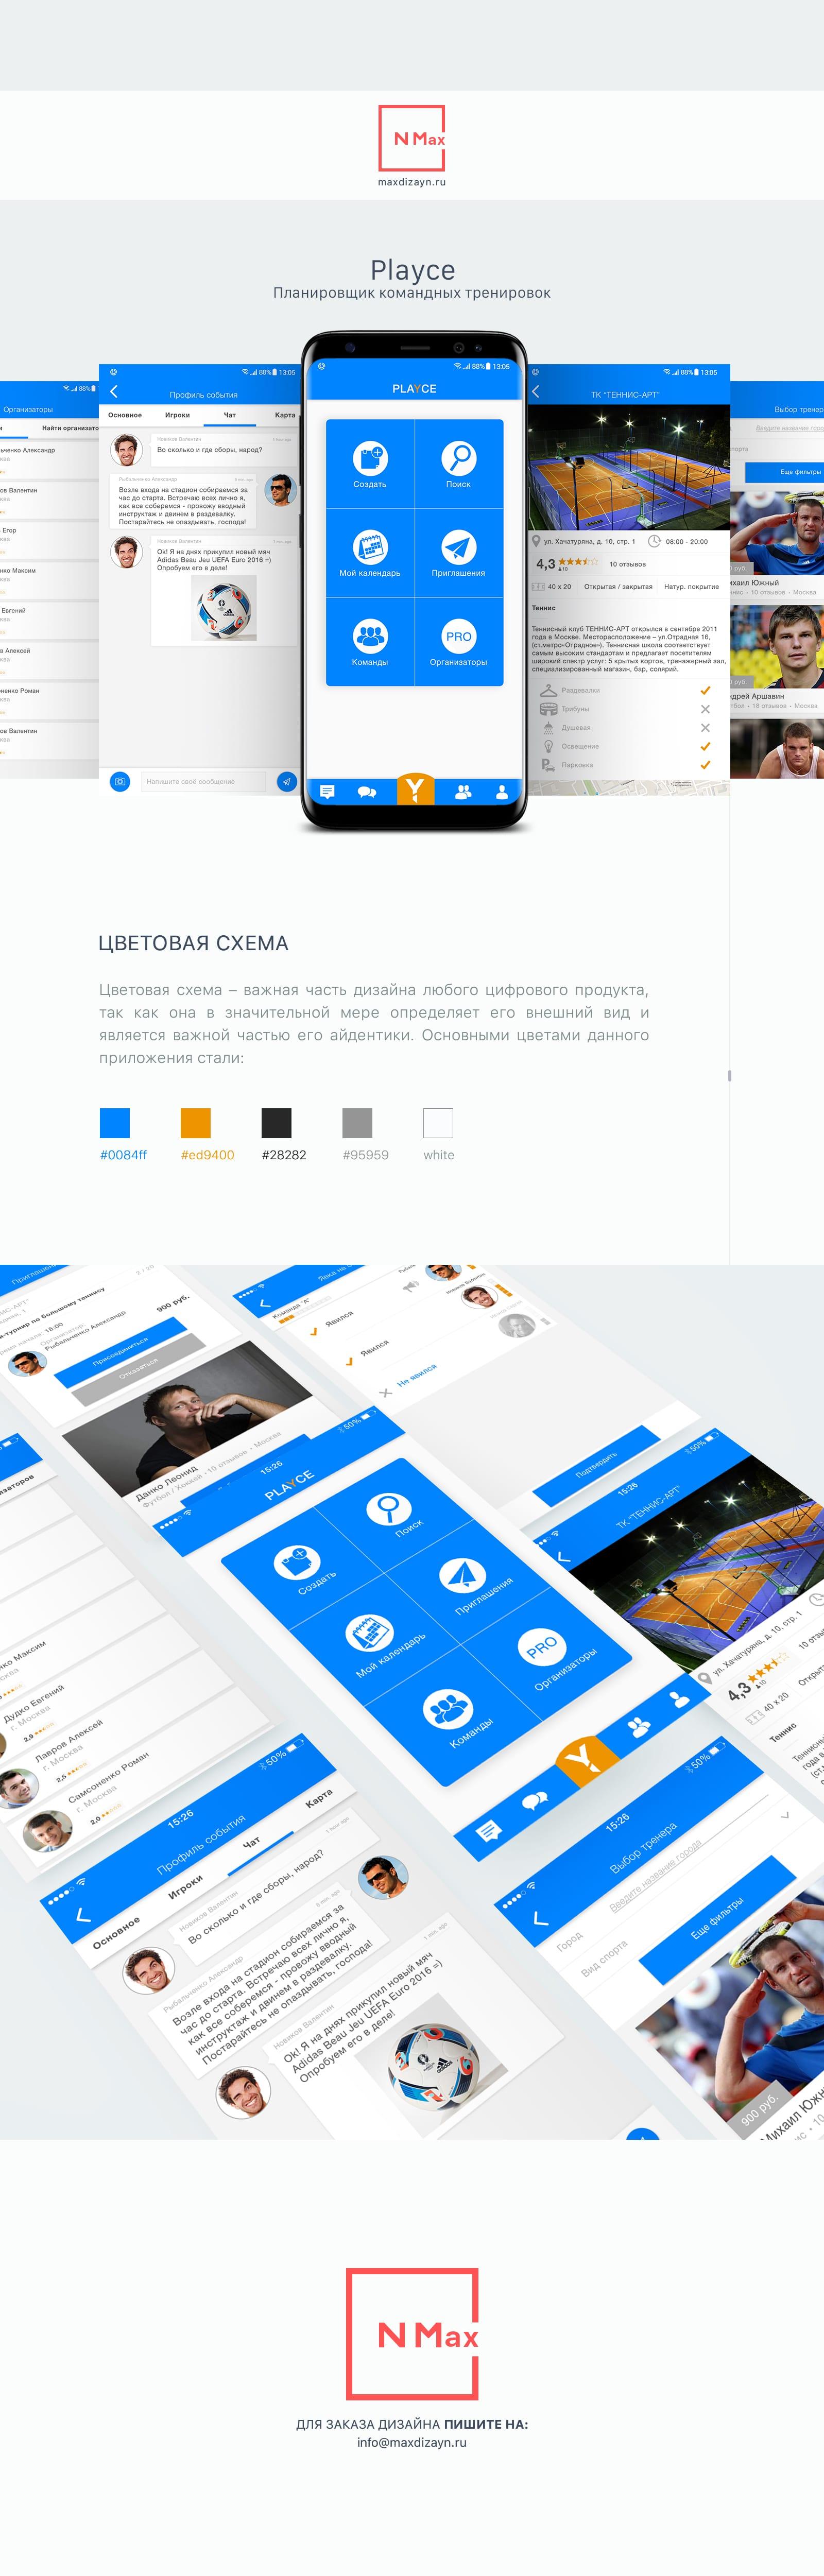 PLAYCE (органайзер тренировок, iOS/Android)